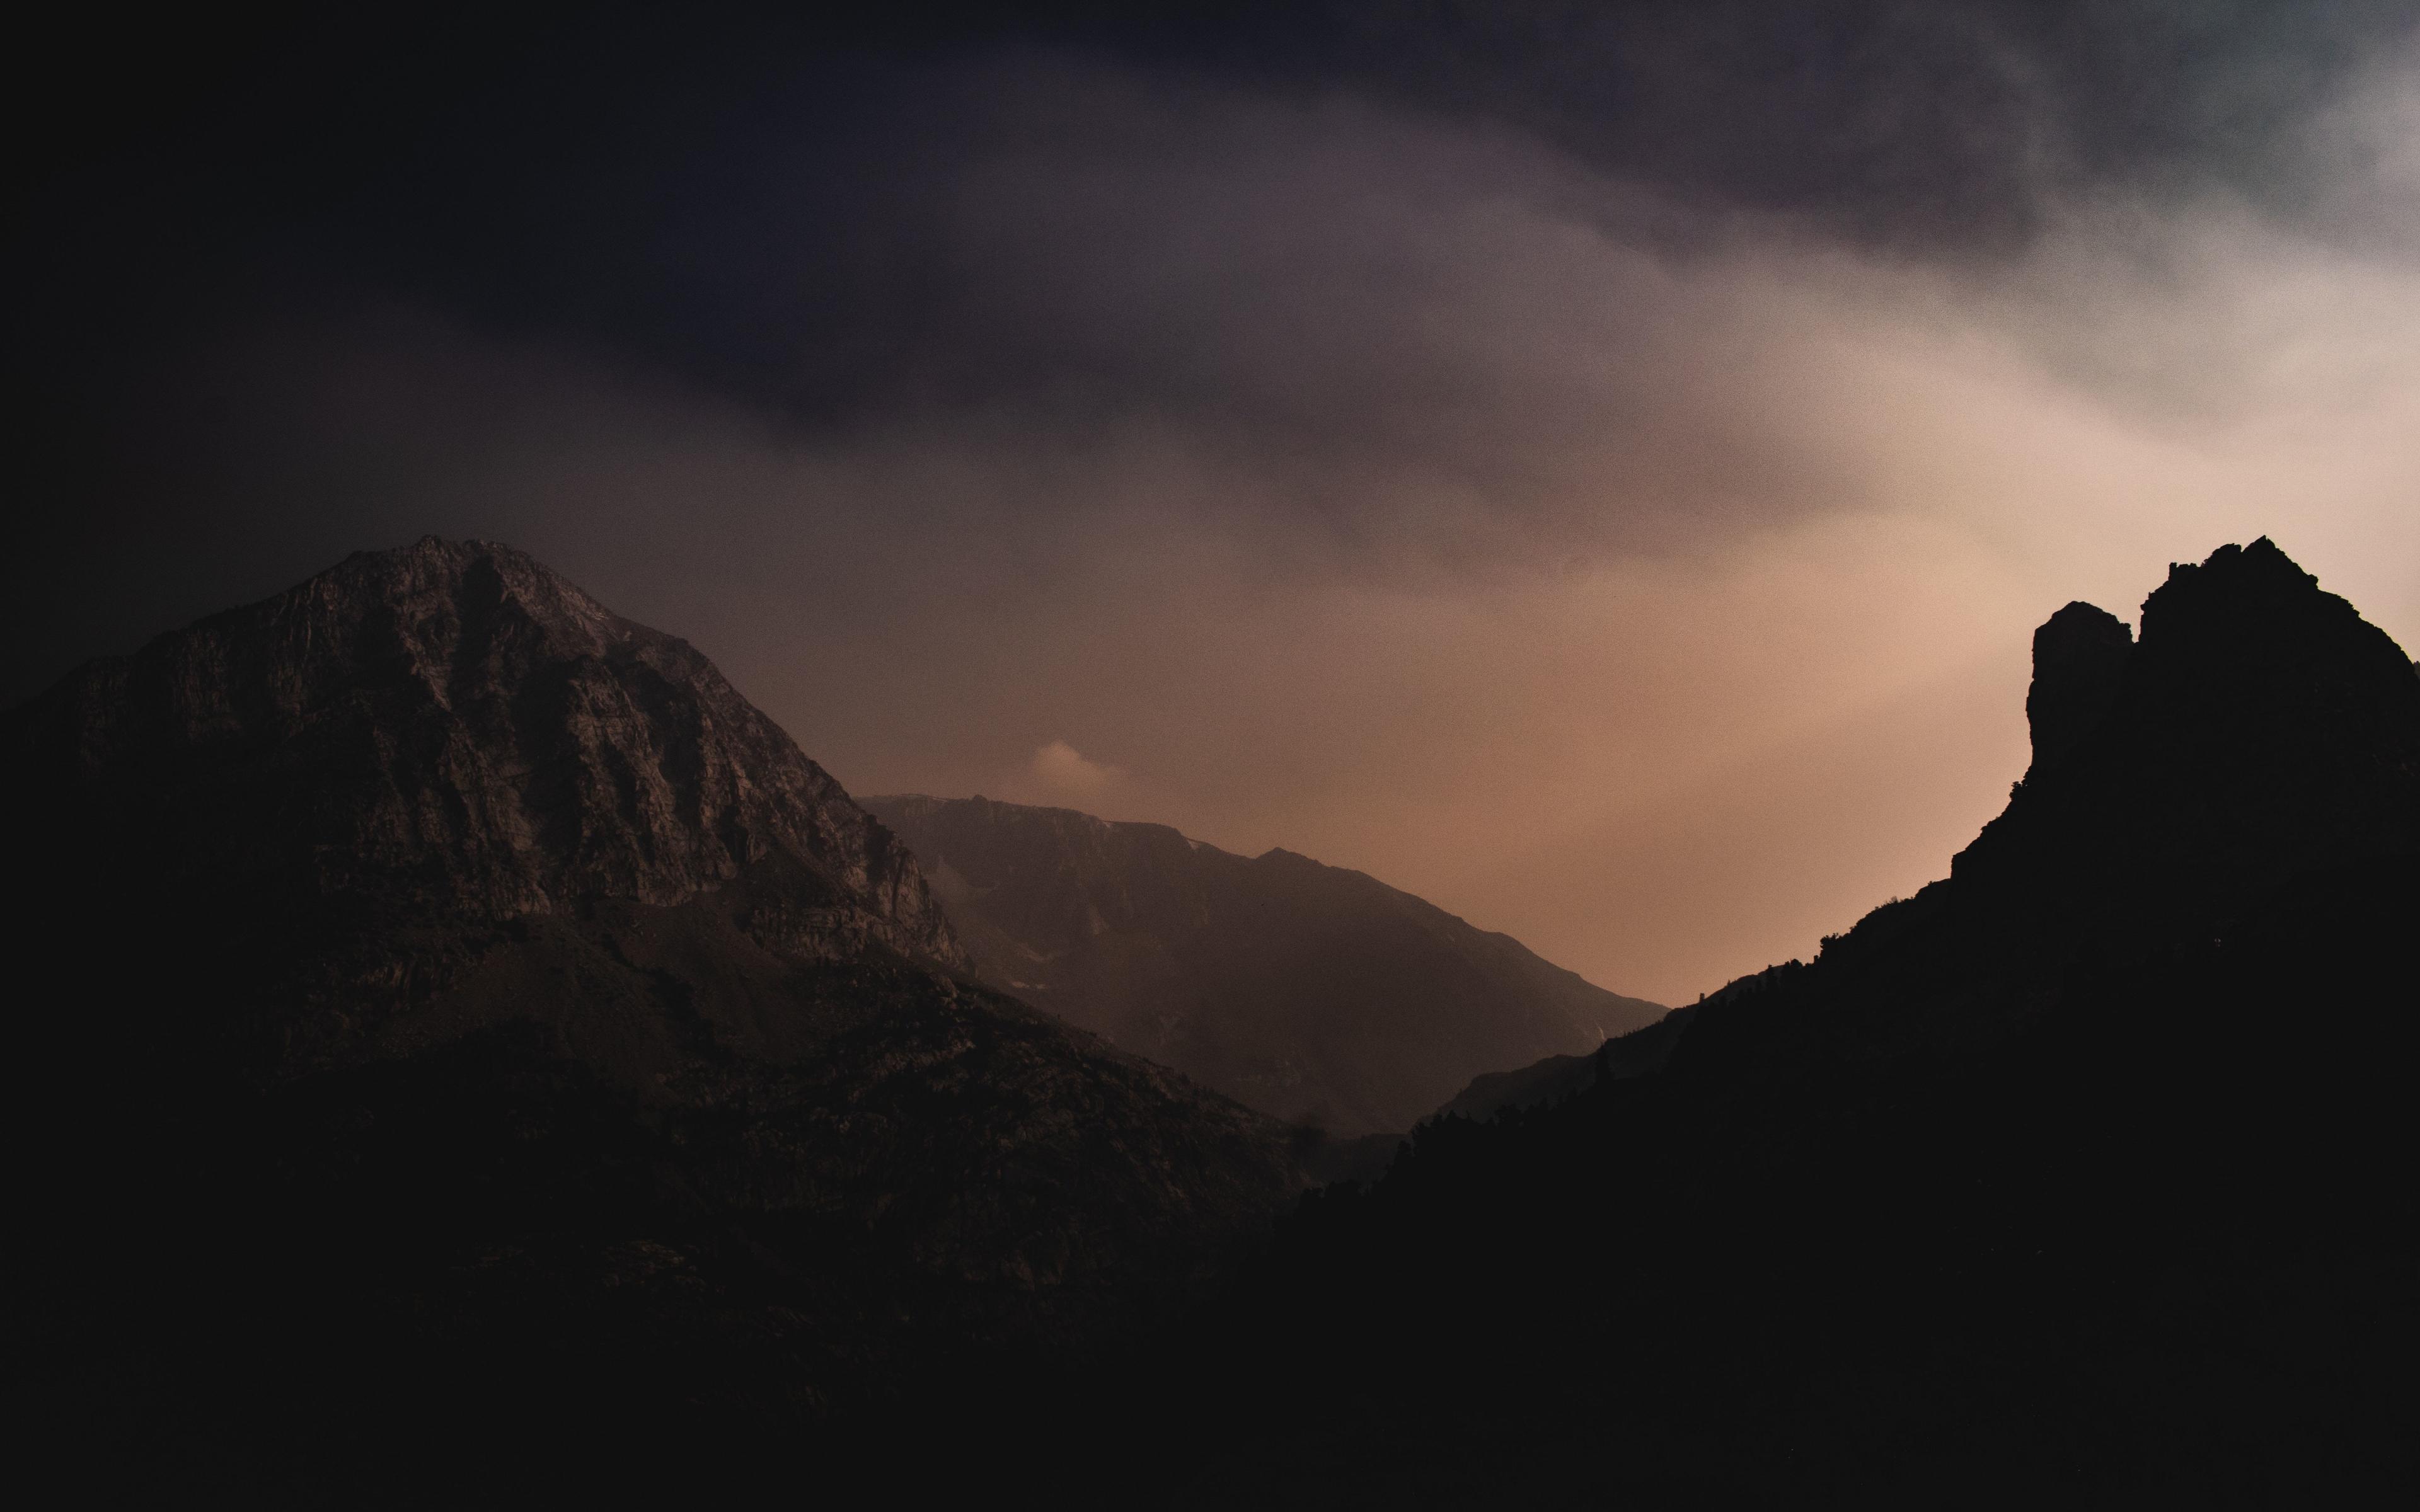 Download 3840x2400 Wallpaper Tioga Pass Yosemite Valley Dark